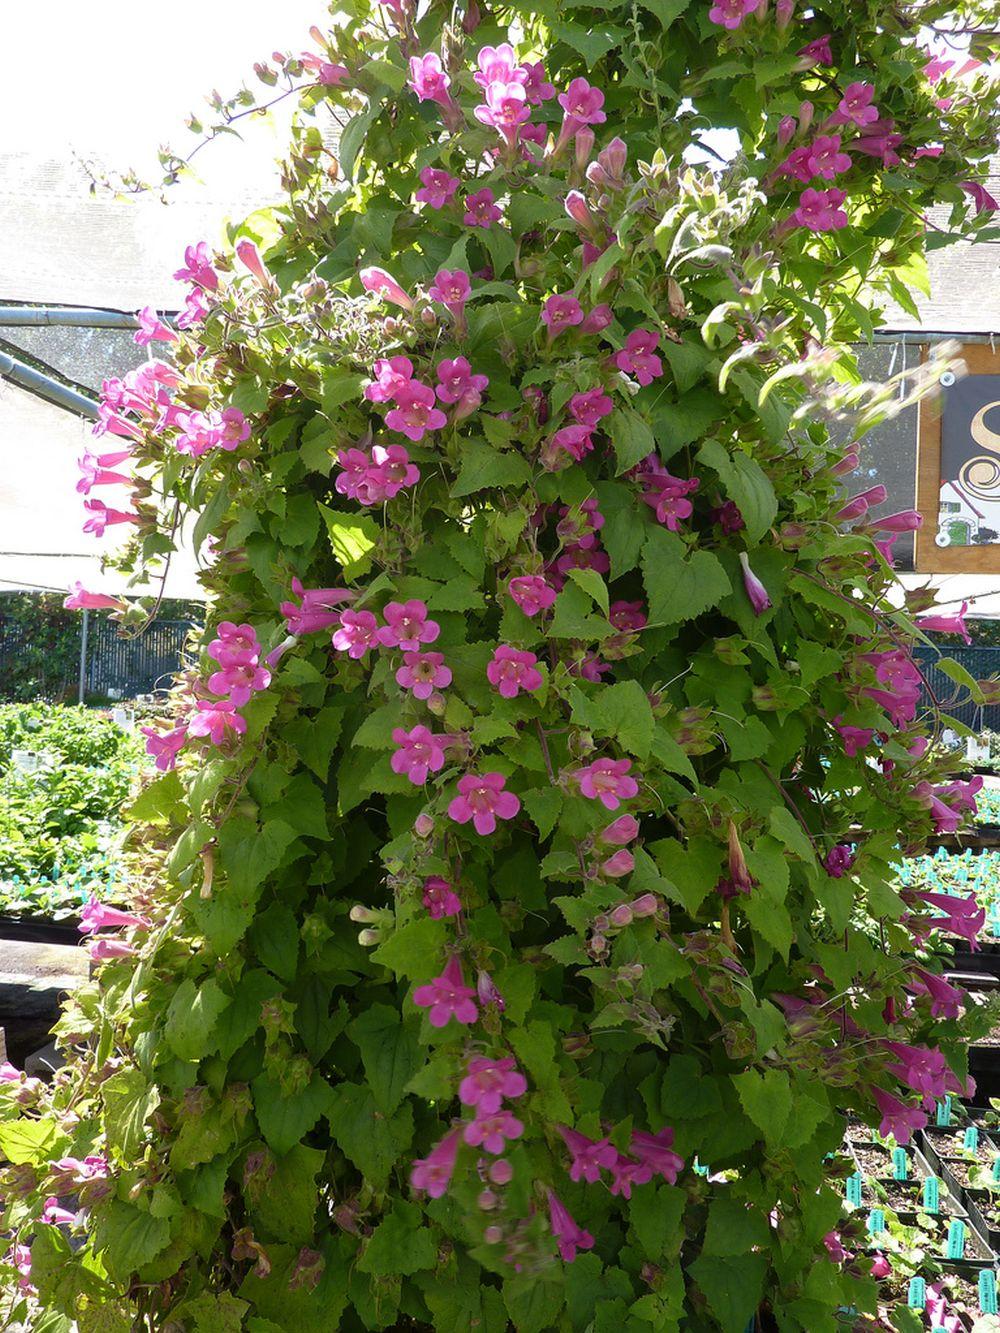 adelaparvu.com top 5 plante cataratoare, Text Carli Marian, In foto Lophospermum (3)